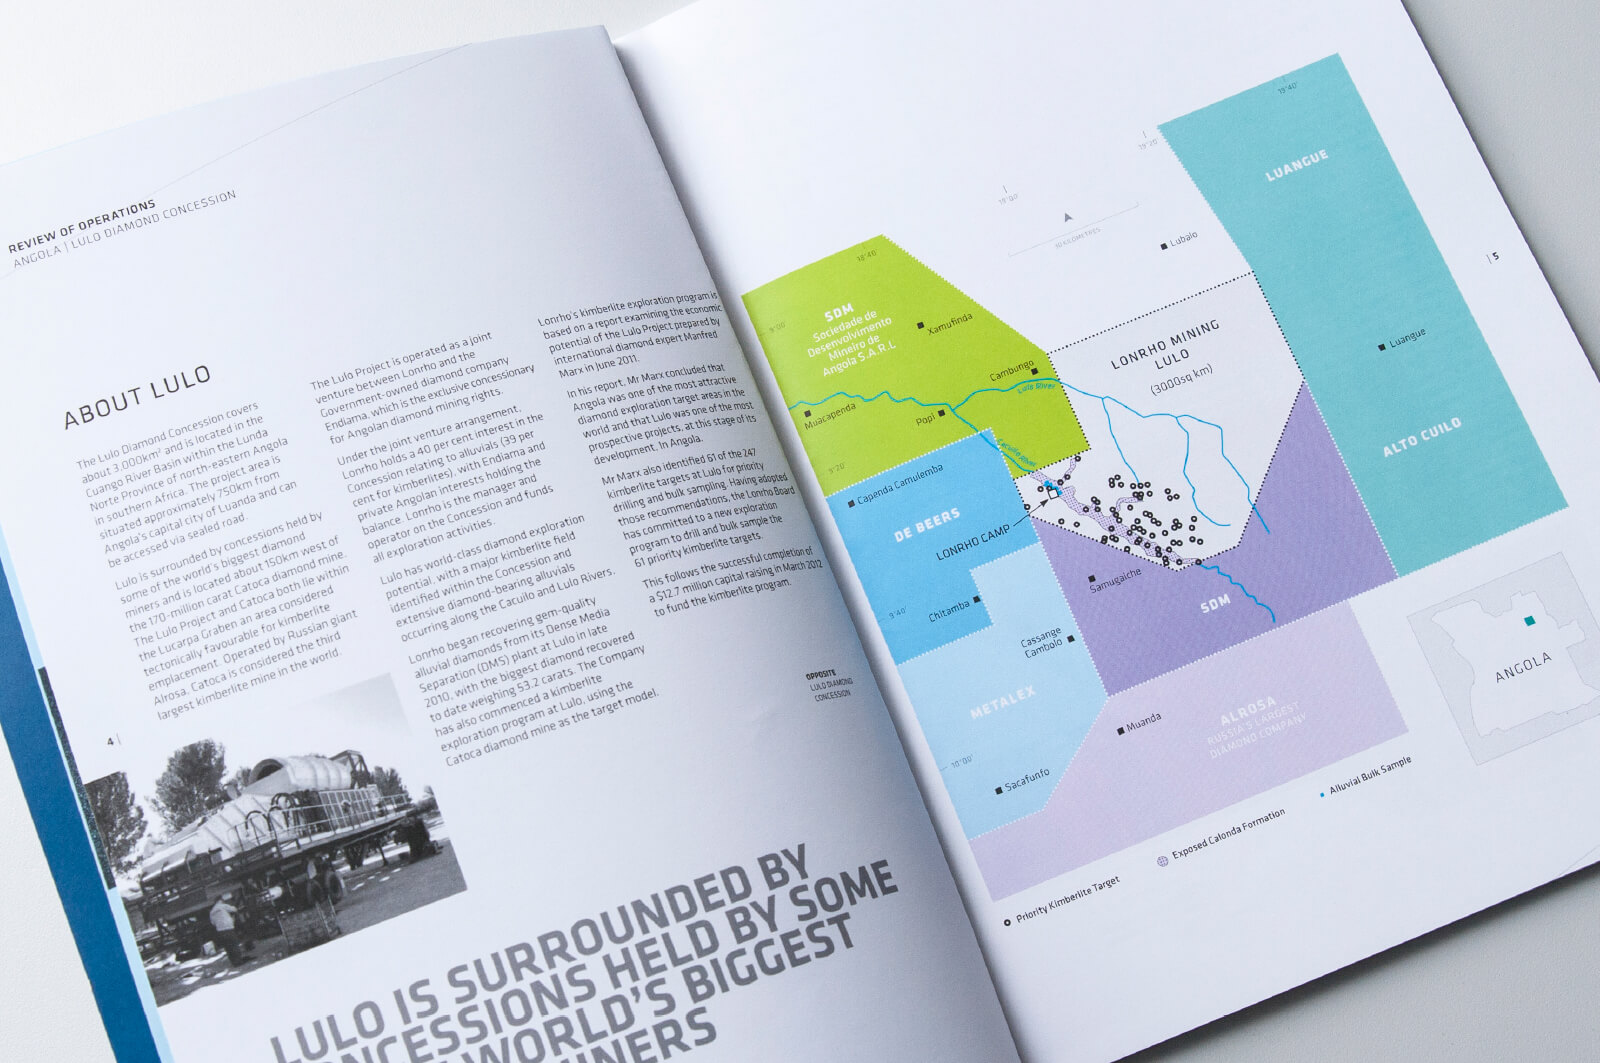 Lonrho-annual-report-2012-2